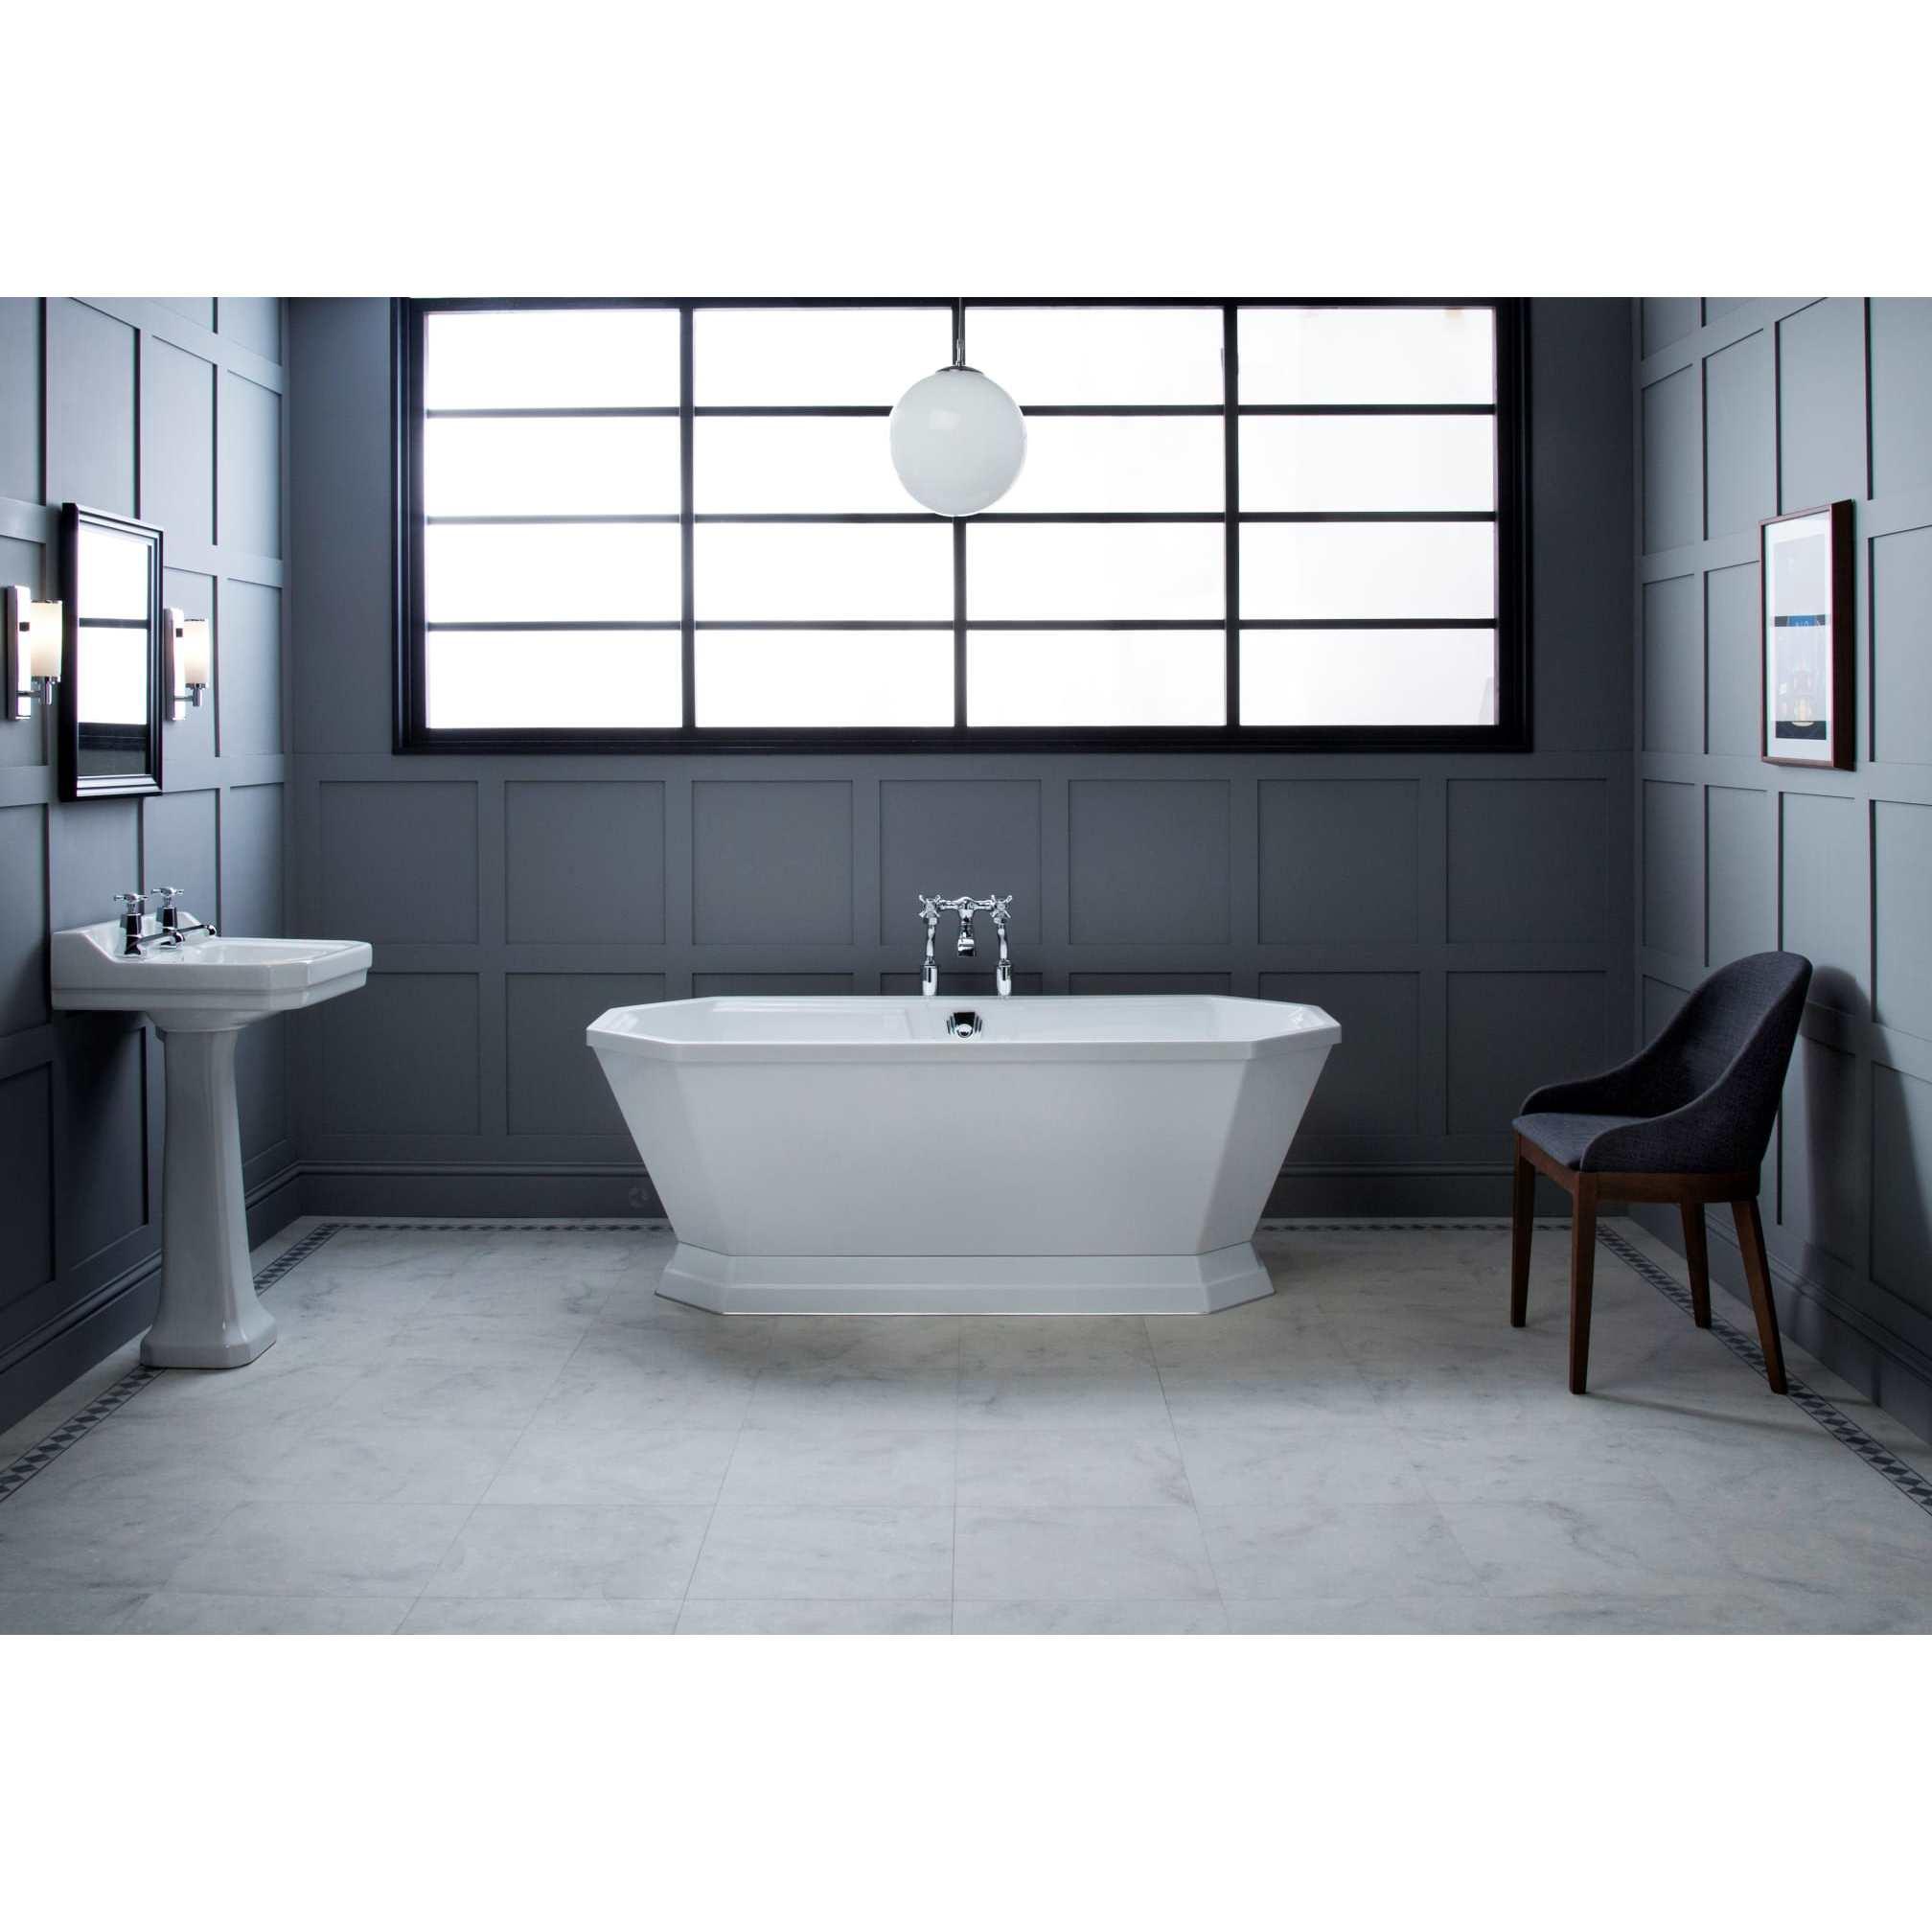 A S Bathrooms Ltd - Hitchin, Hertfordshire SG4 9DN - 07769 678707 | ShowMeLocal.com